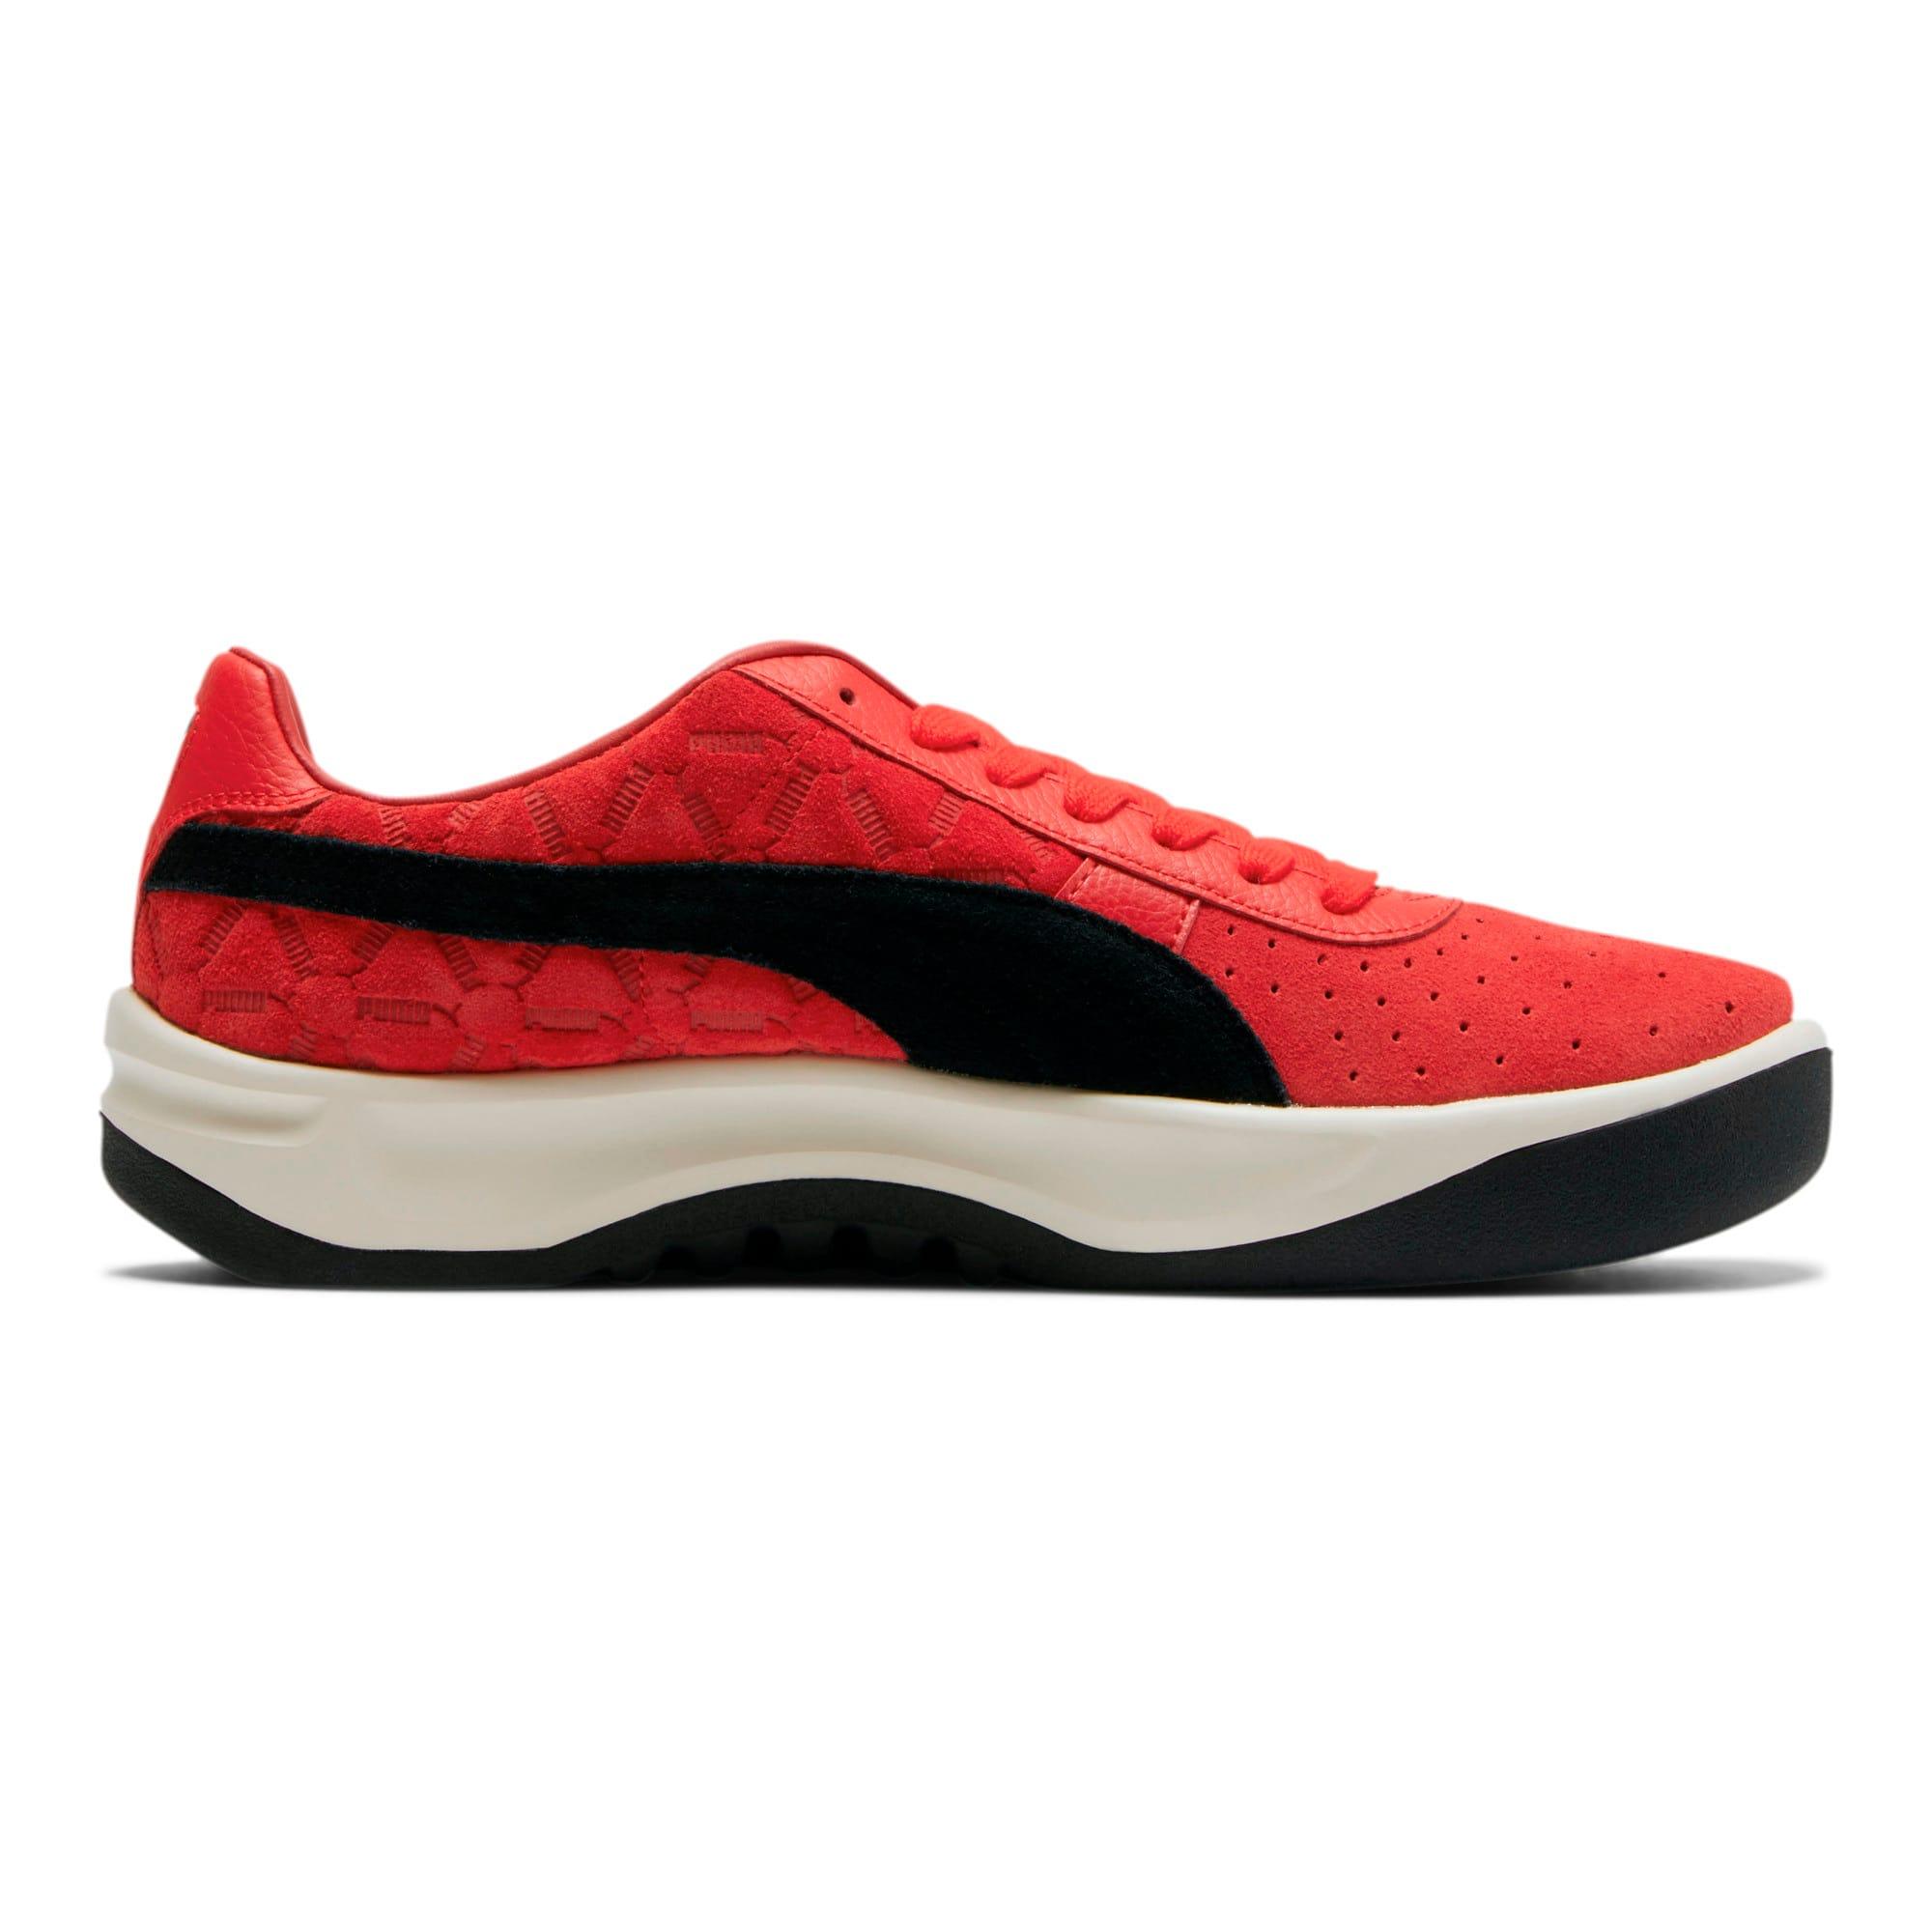 Miniatura 5 de Zapatos deportivos GV SpecialLux, HighRiskRed-P Blk-WhisperWht, mediano